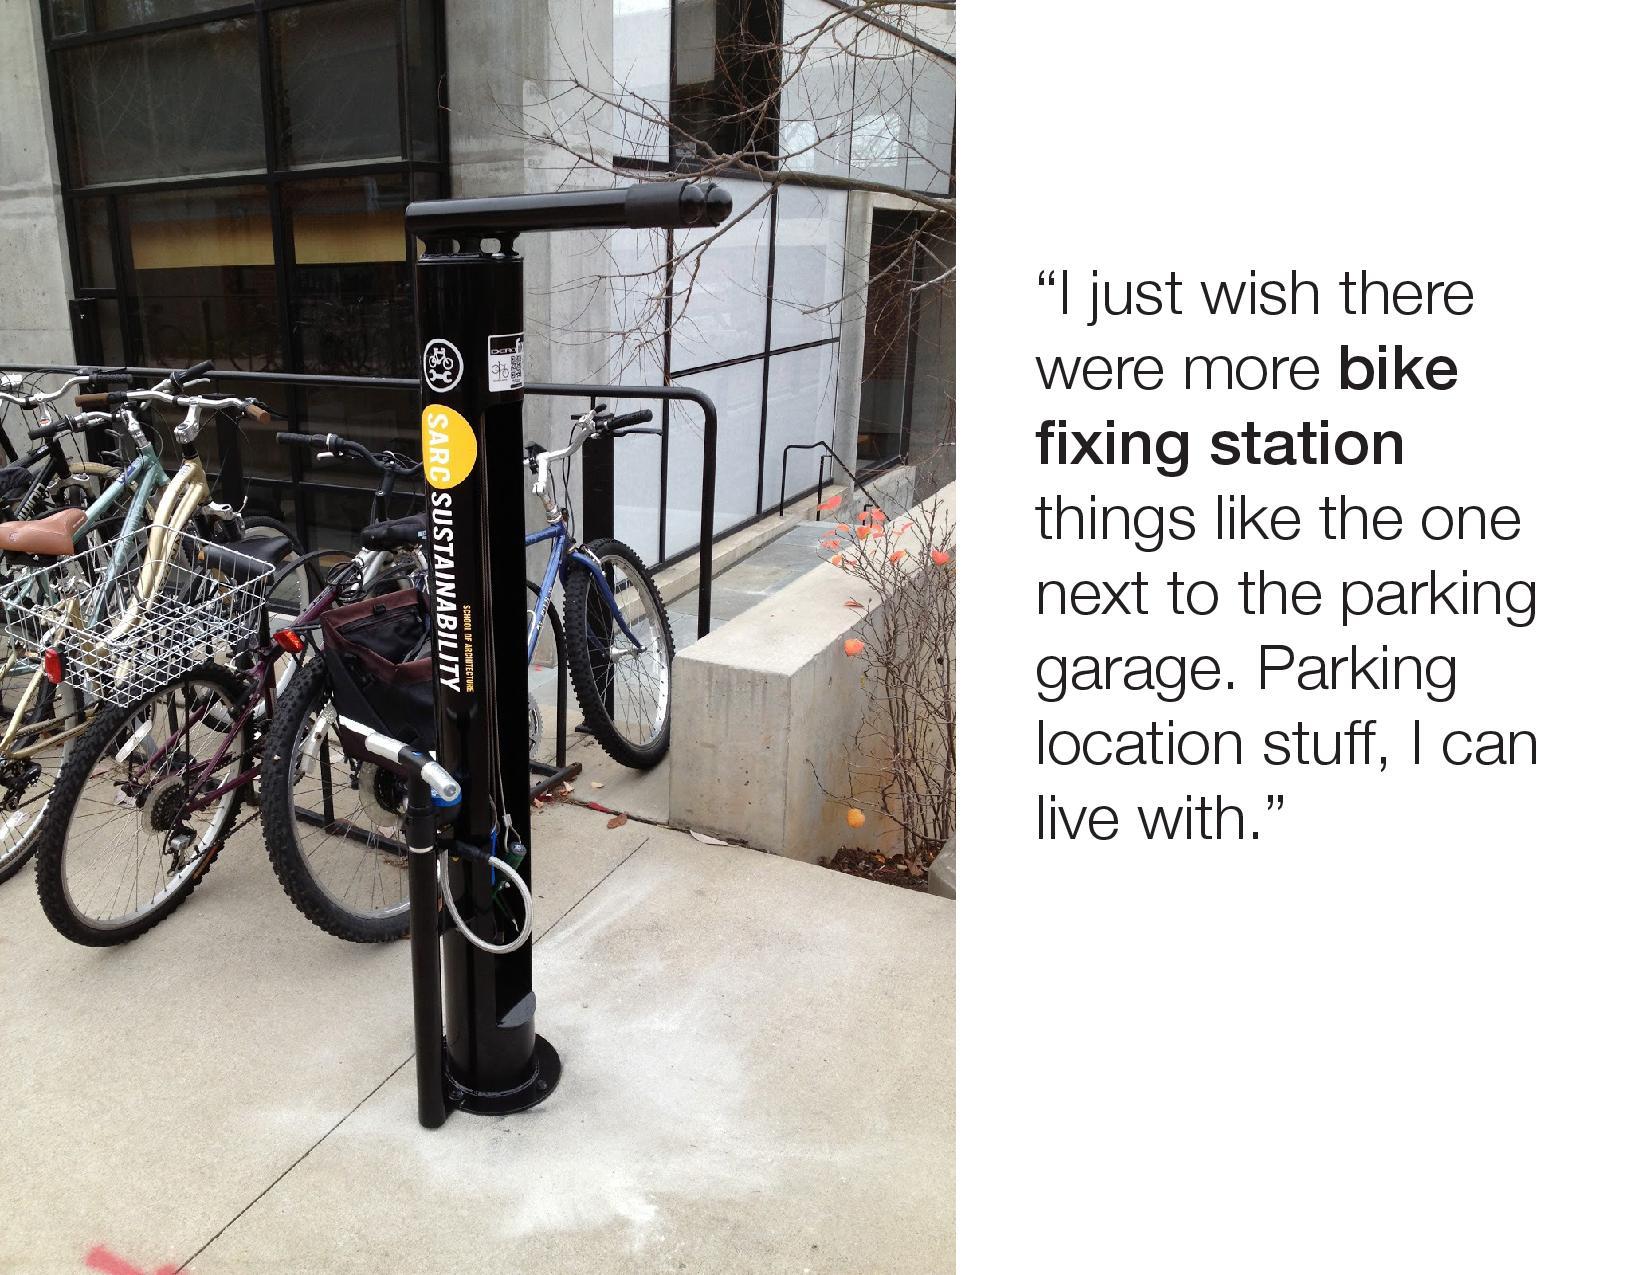 Biker s Nest_quotes-page-003.jpg